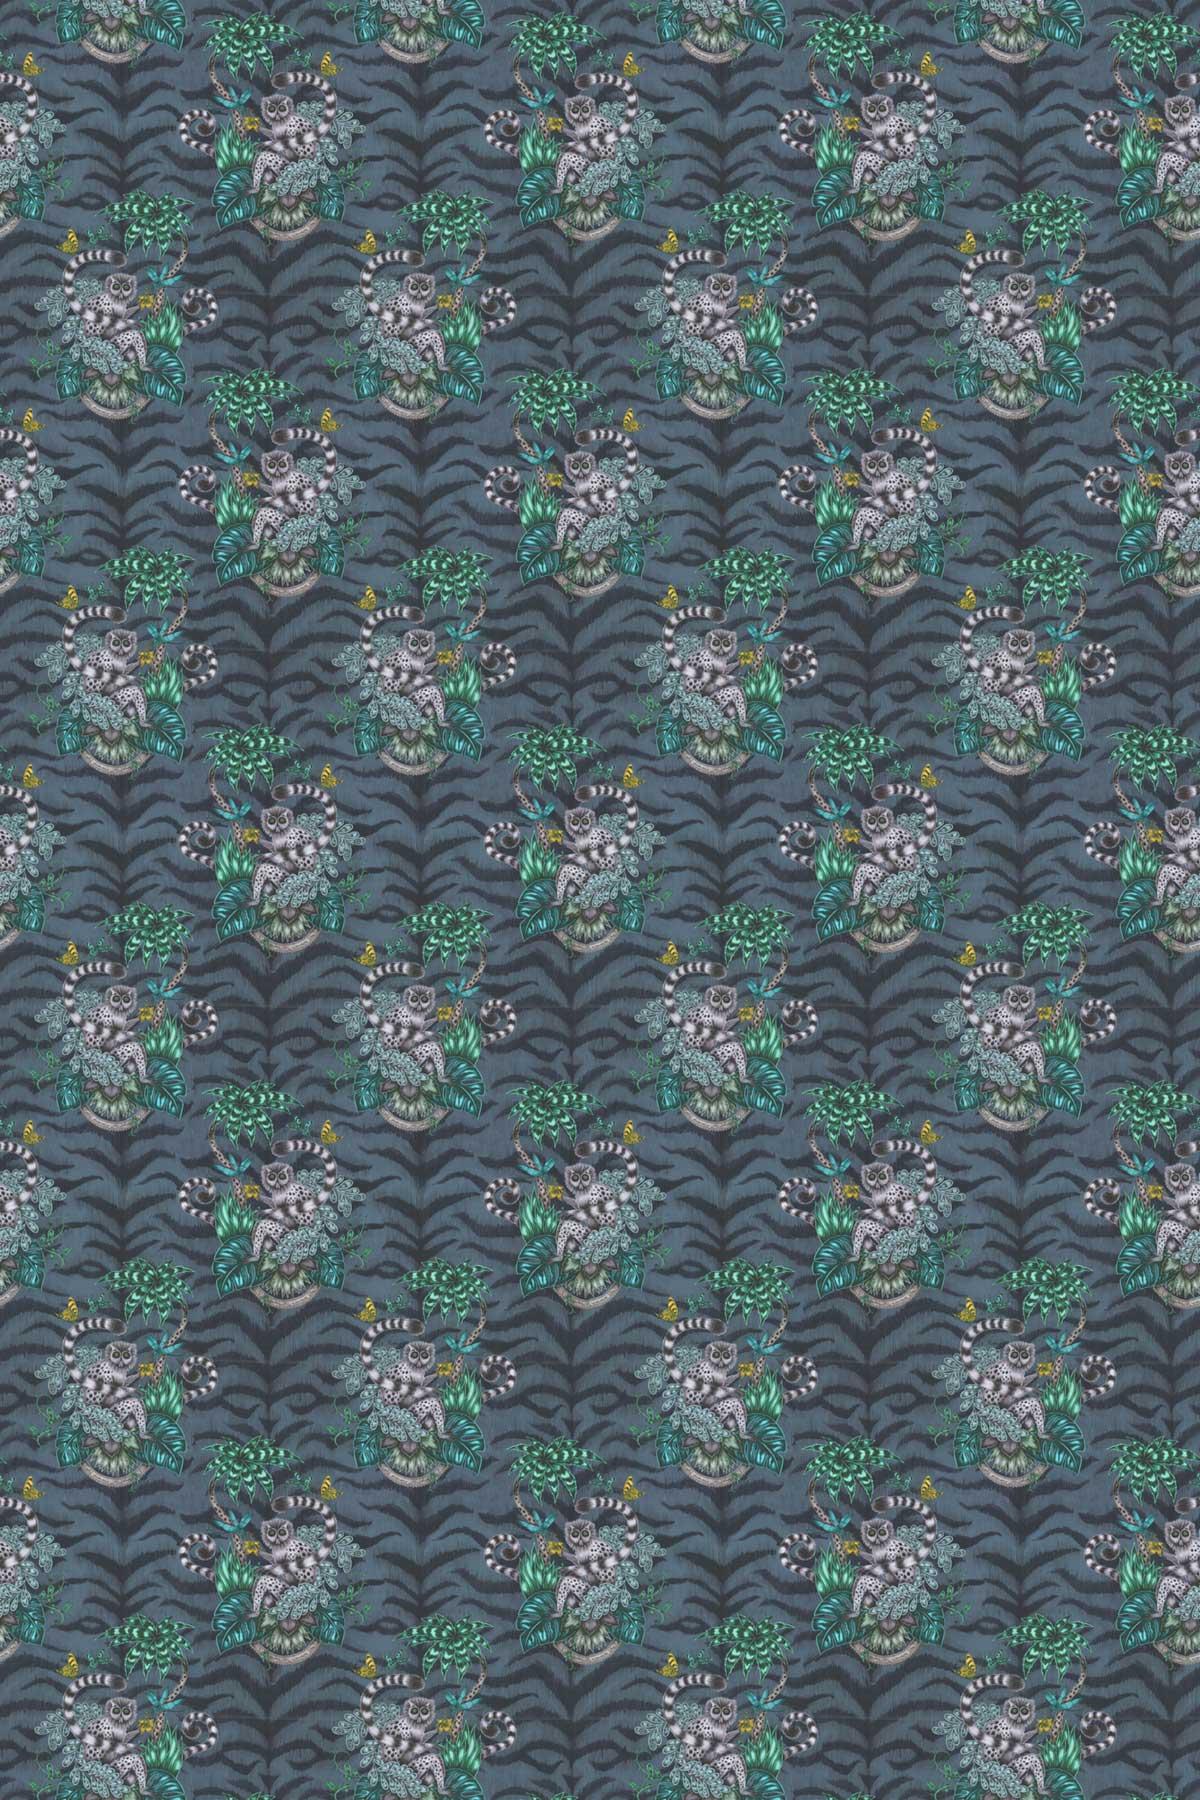 Emma J Shipley Lemur Navy Fabric - Product code: F1112/03